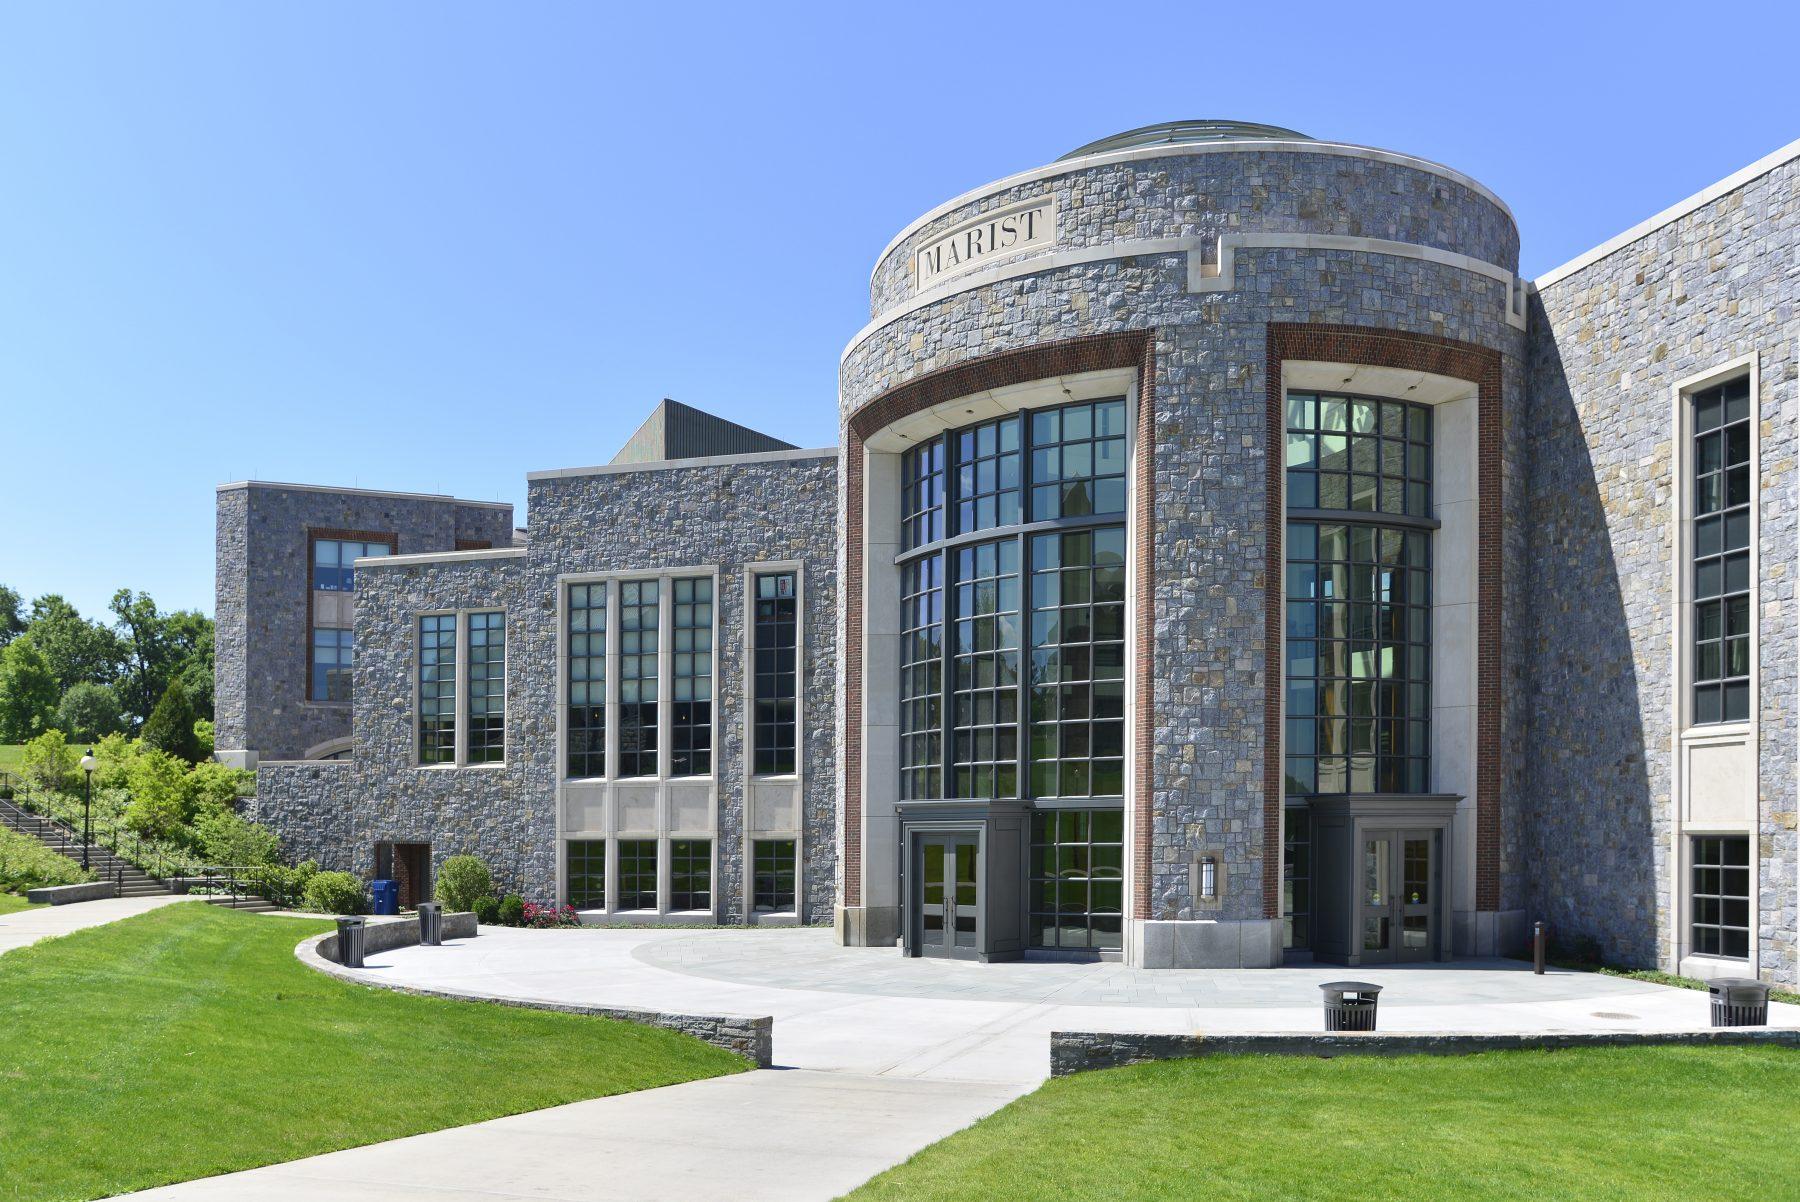 marist college circular stone building